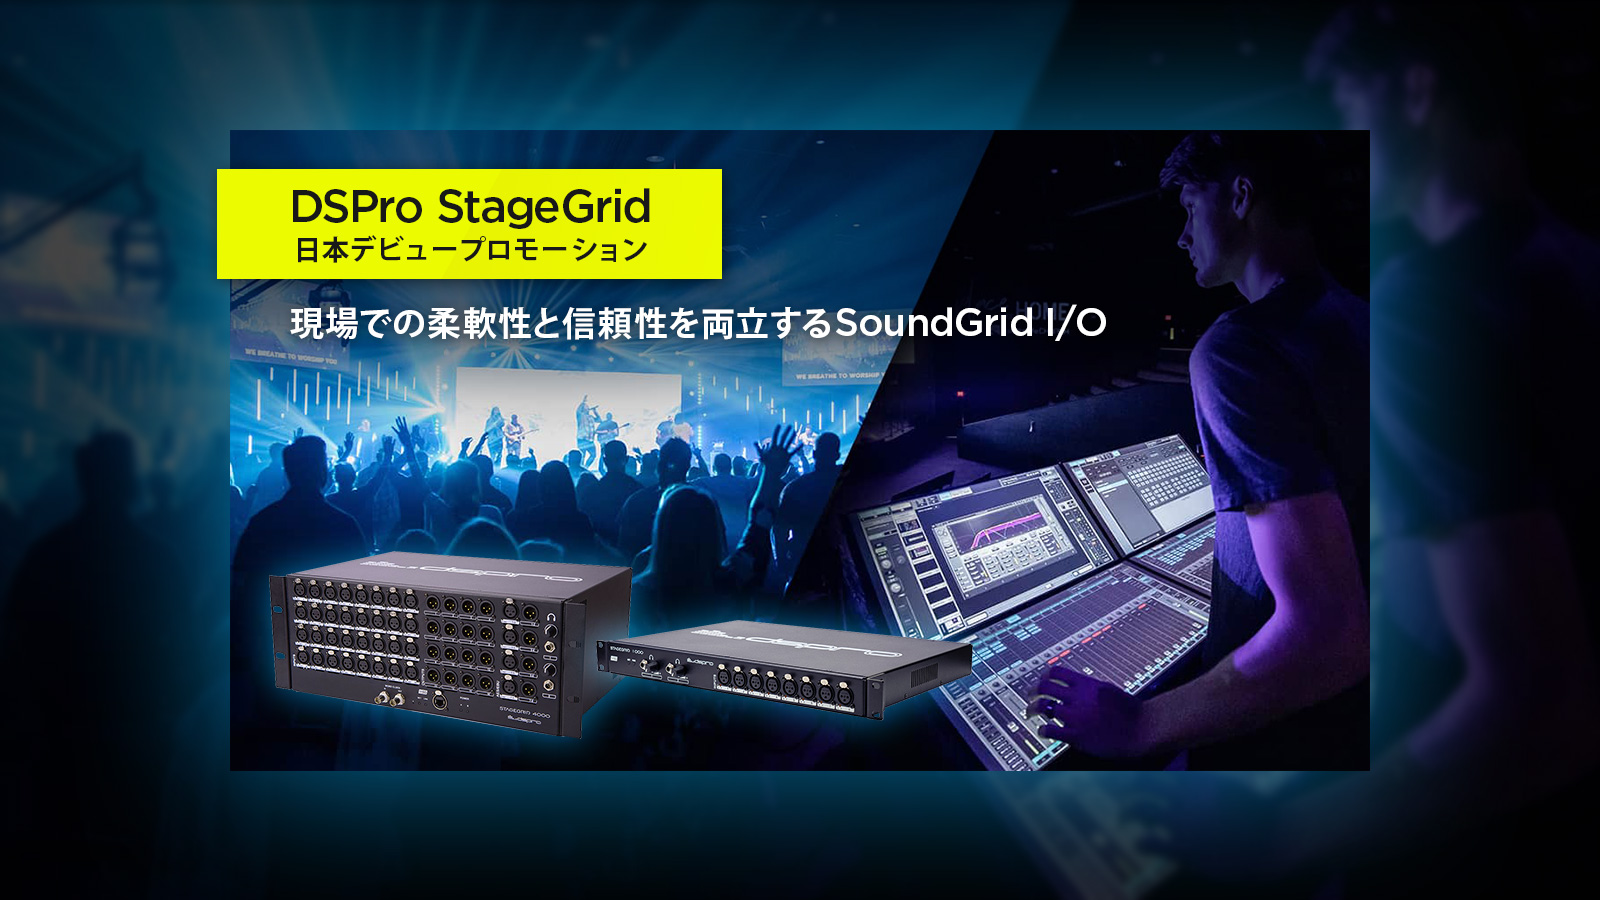 DSPro StageGrid 日本デビュープロモーション